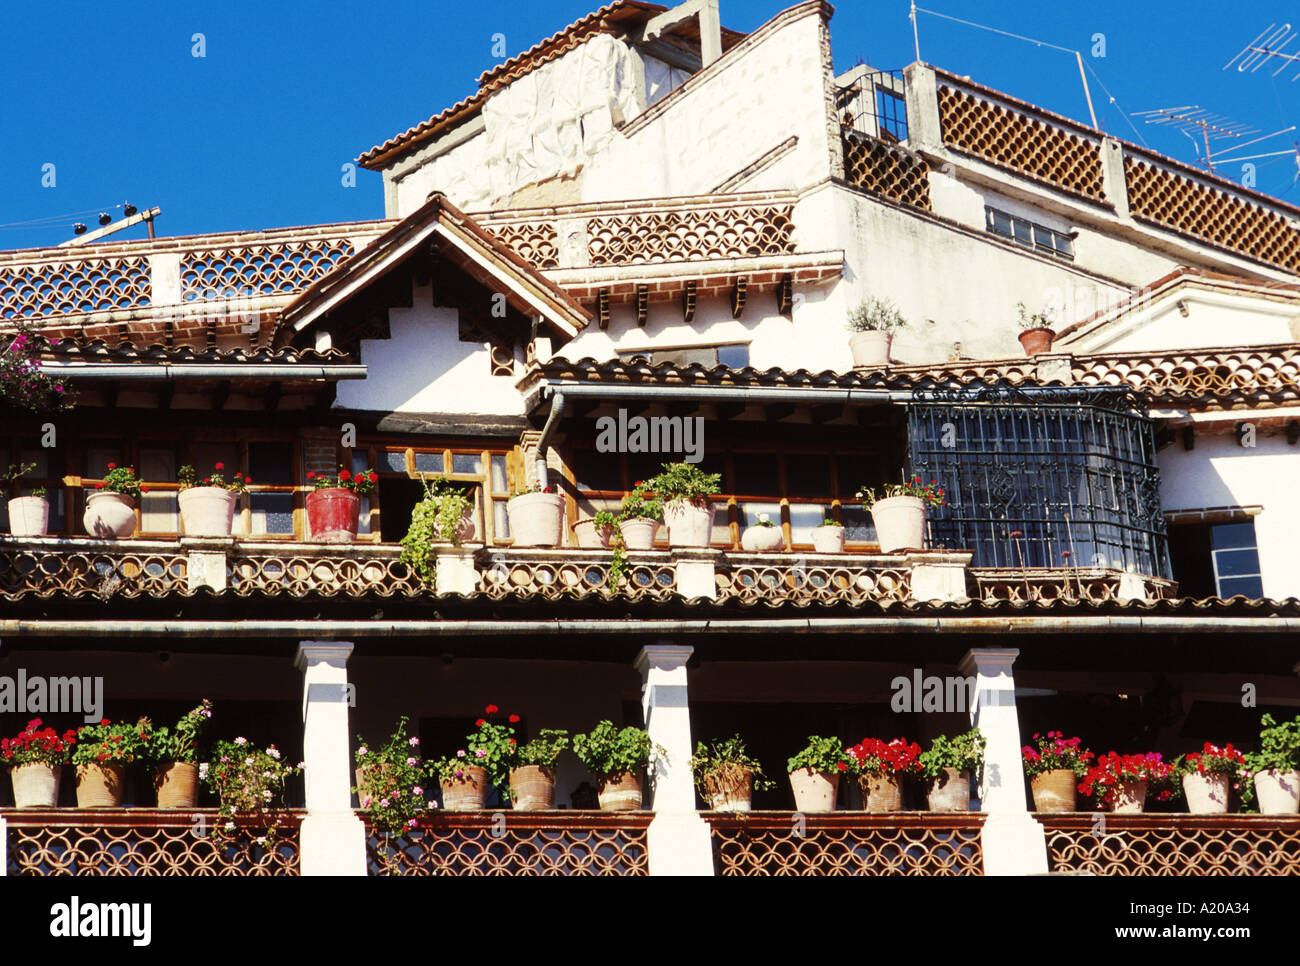 Terrazas En Taxco México Con Macetas La Arquitectura Típica